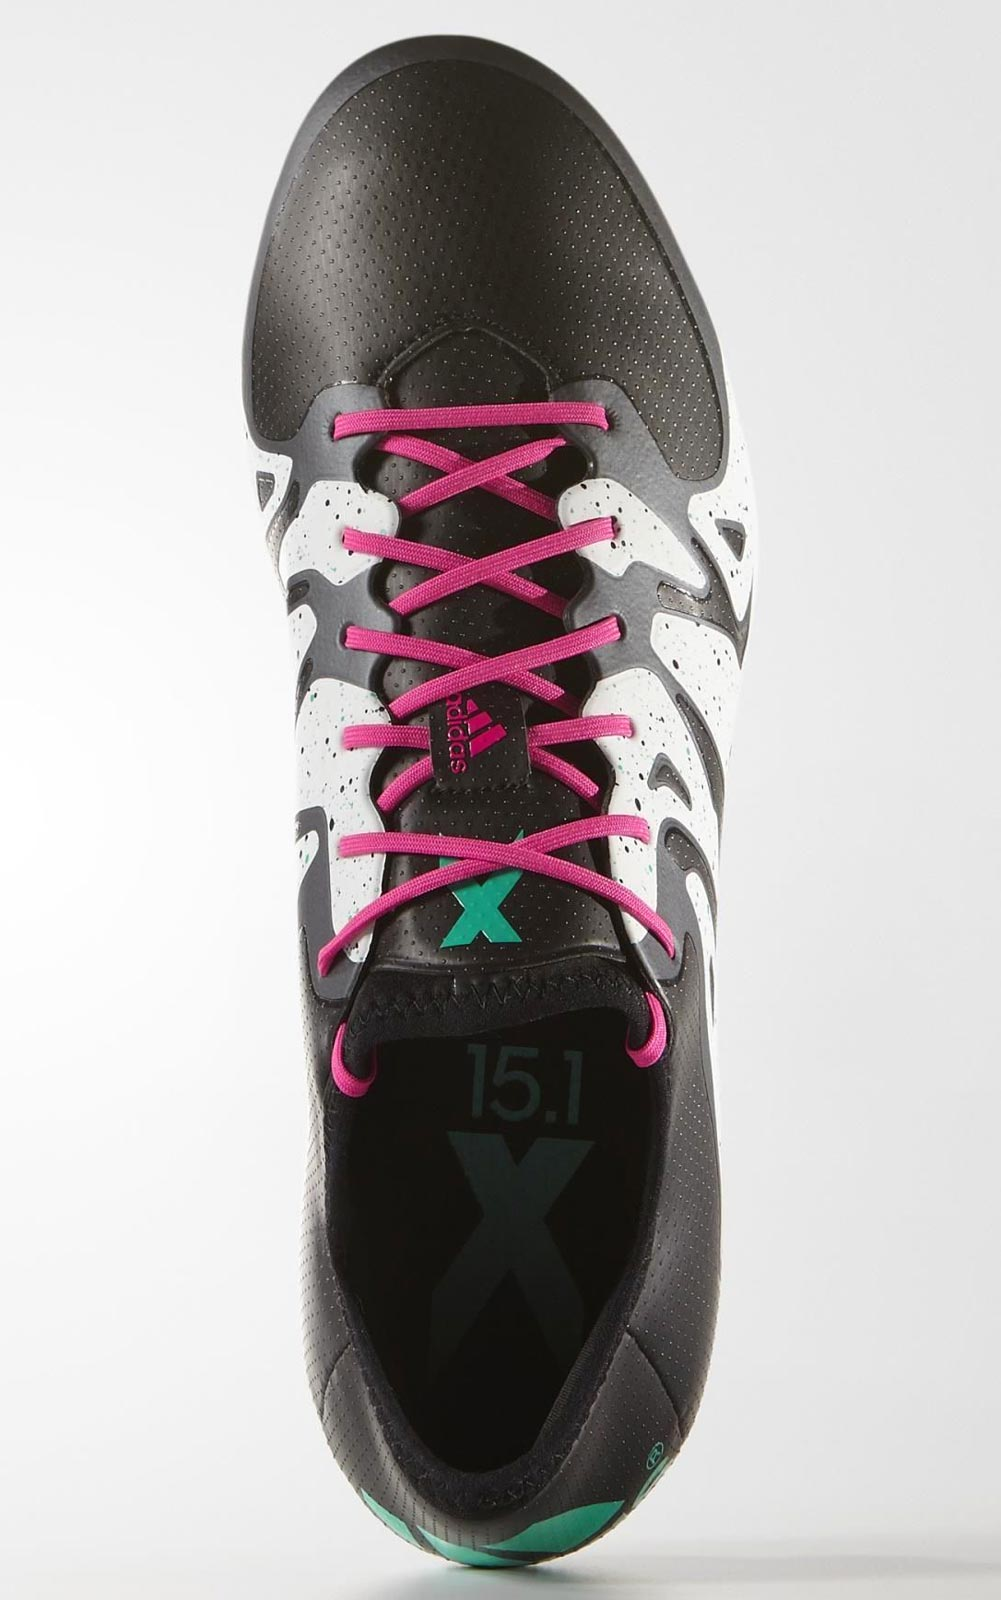 adidas x euro 2016 boots